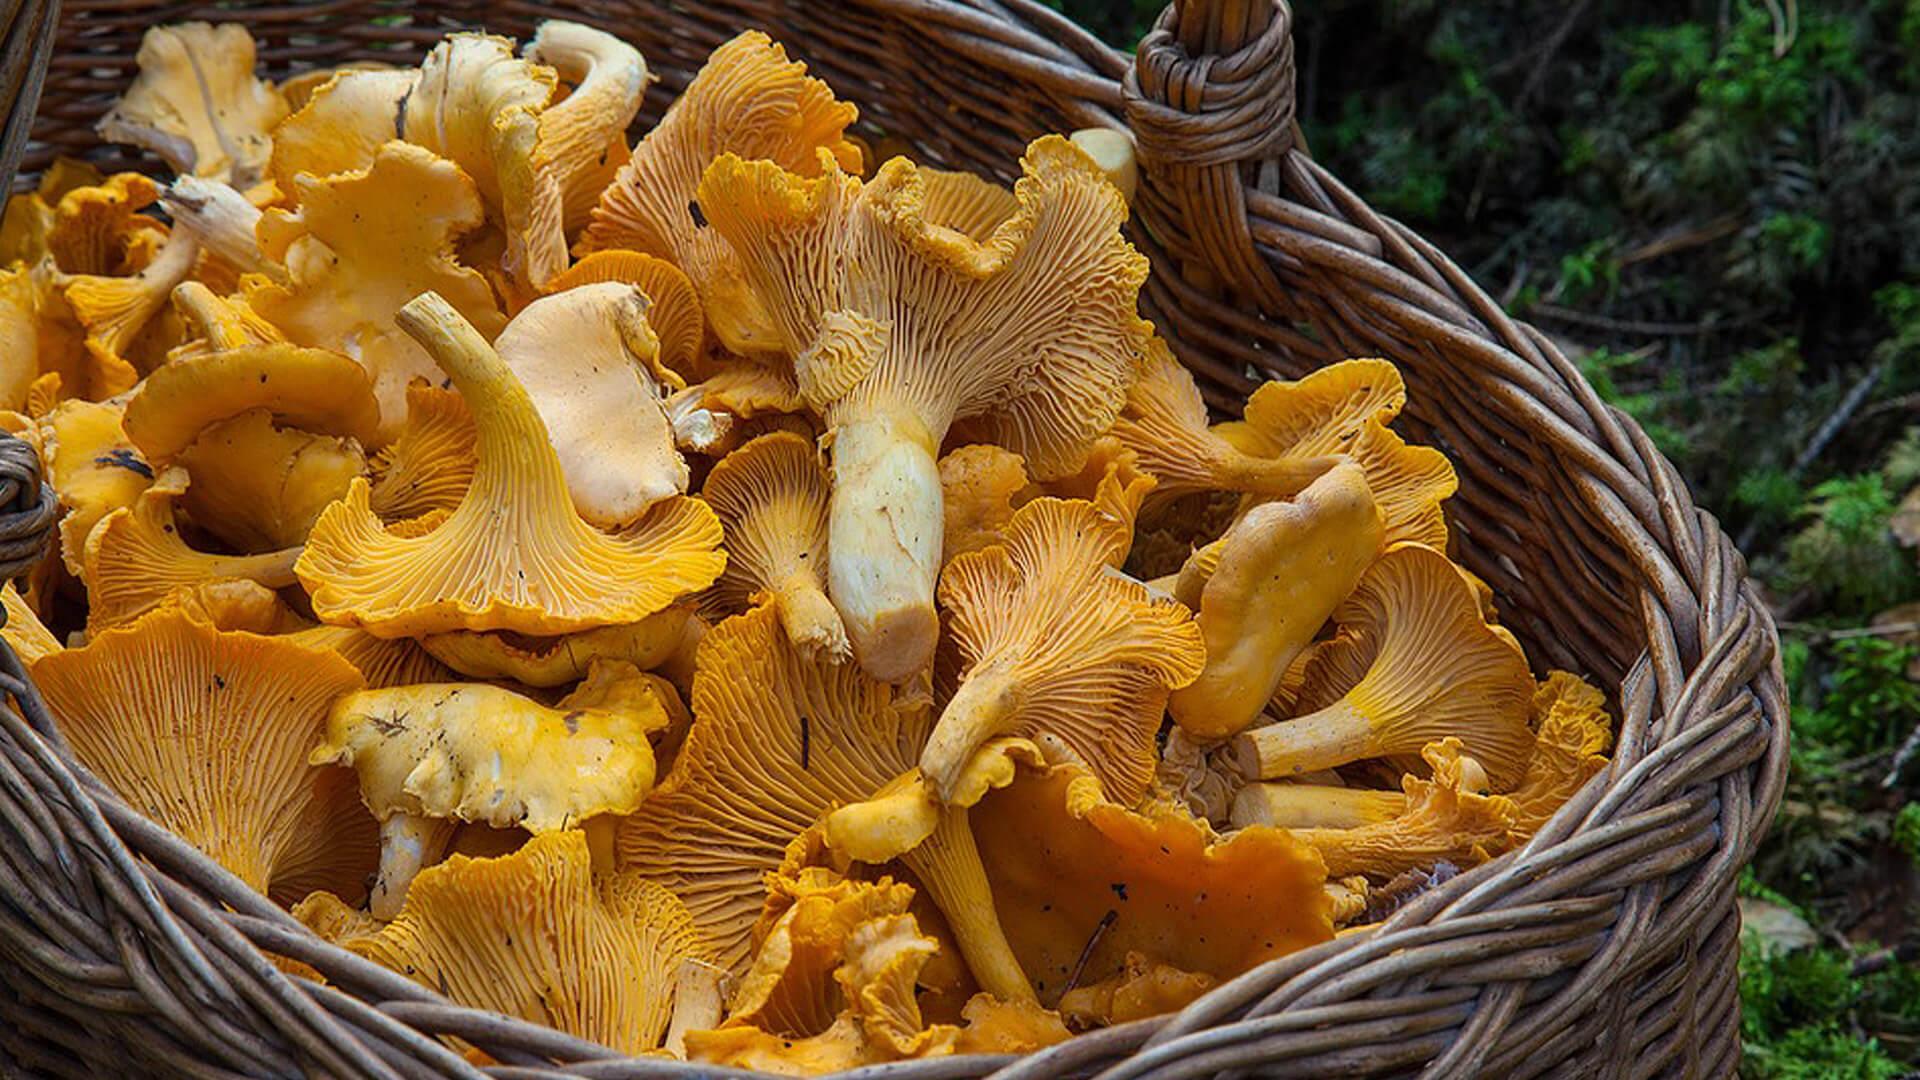 Fungus mushroom autumn mallorca